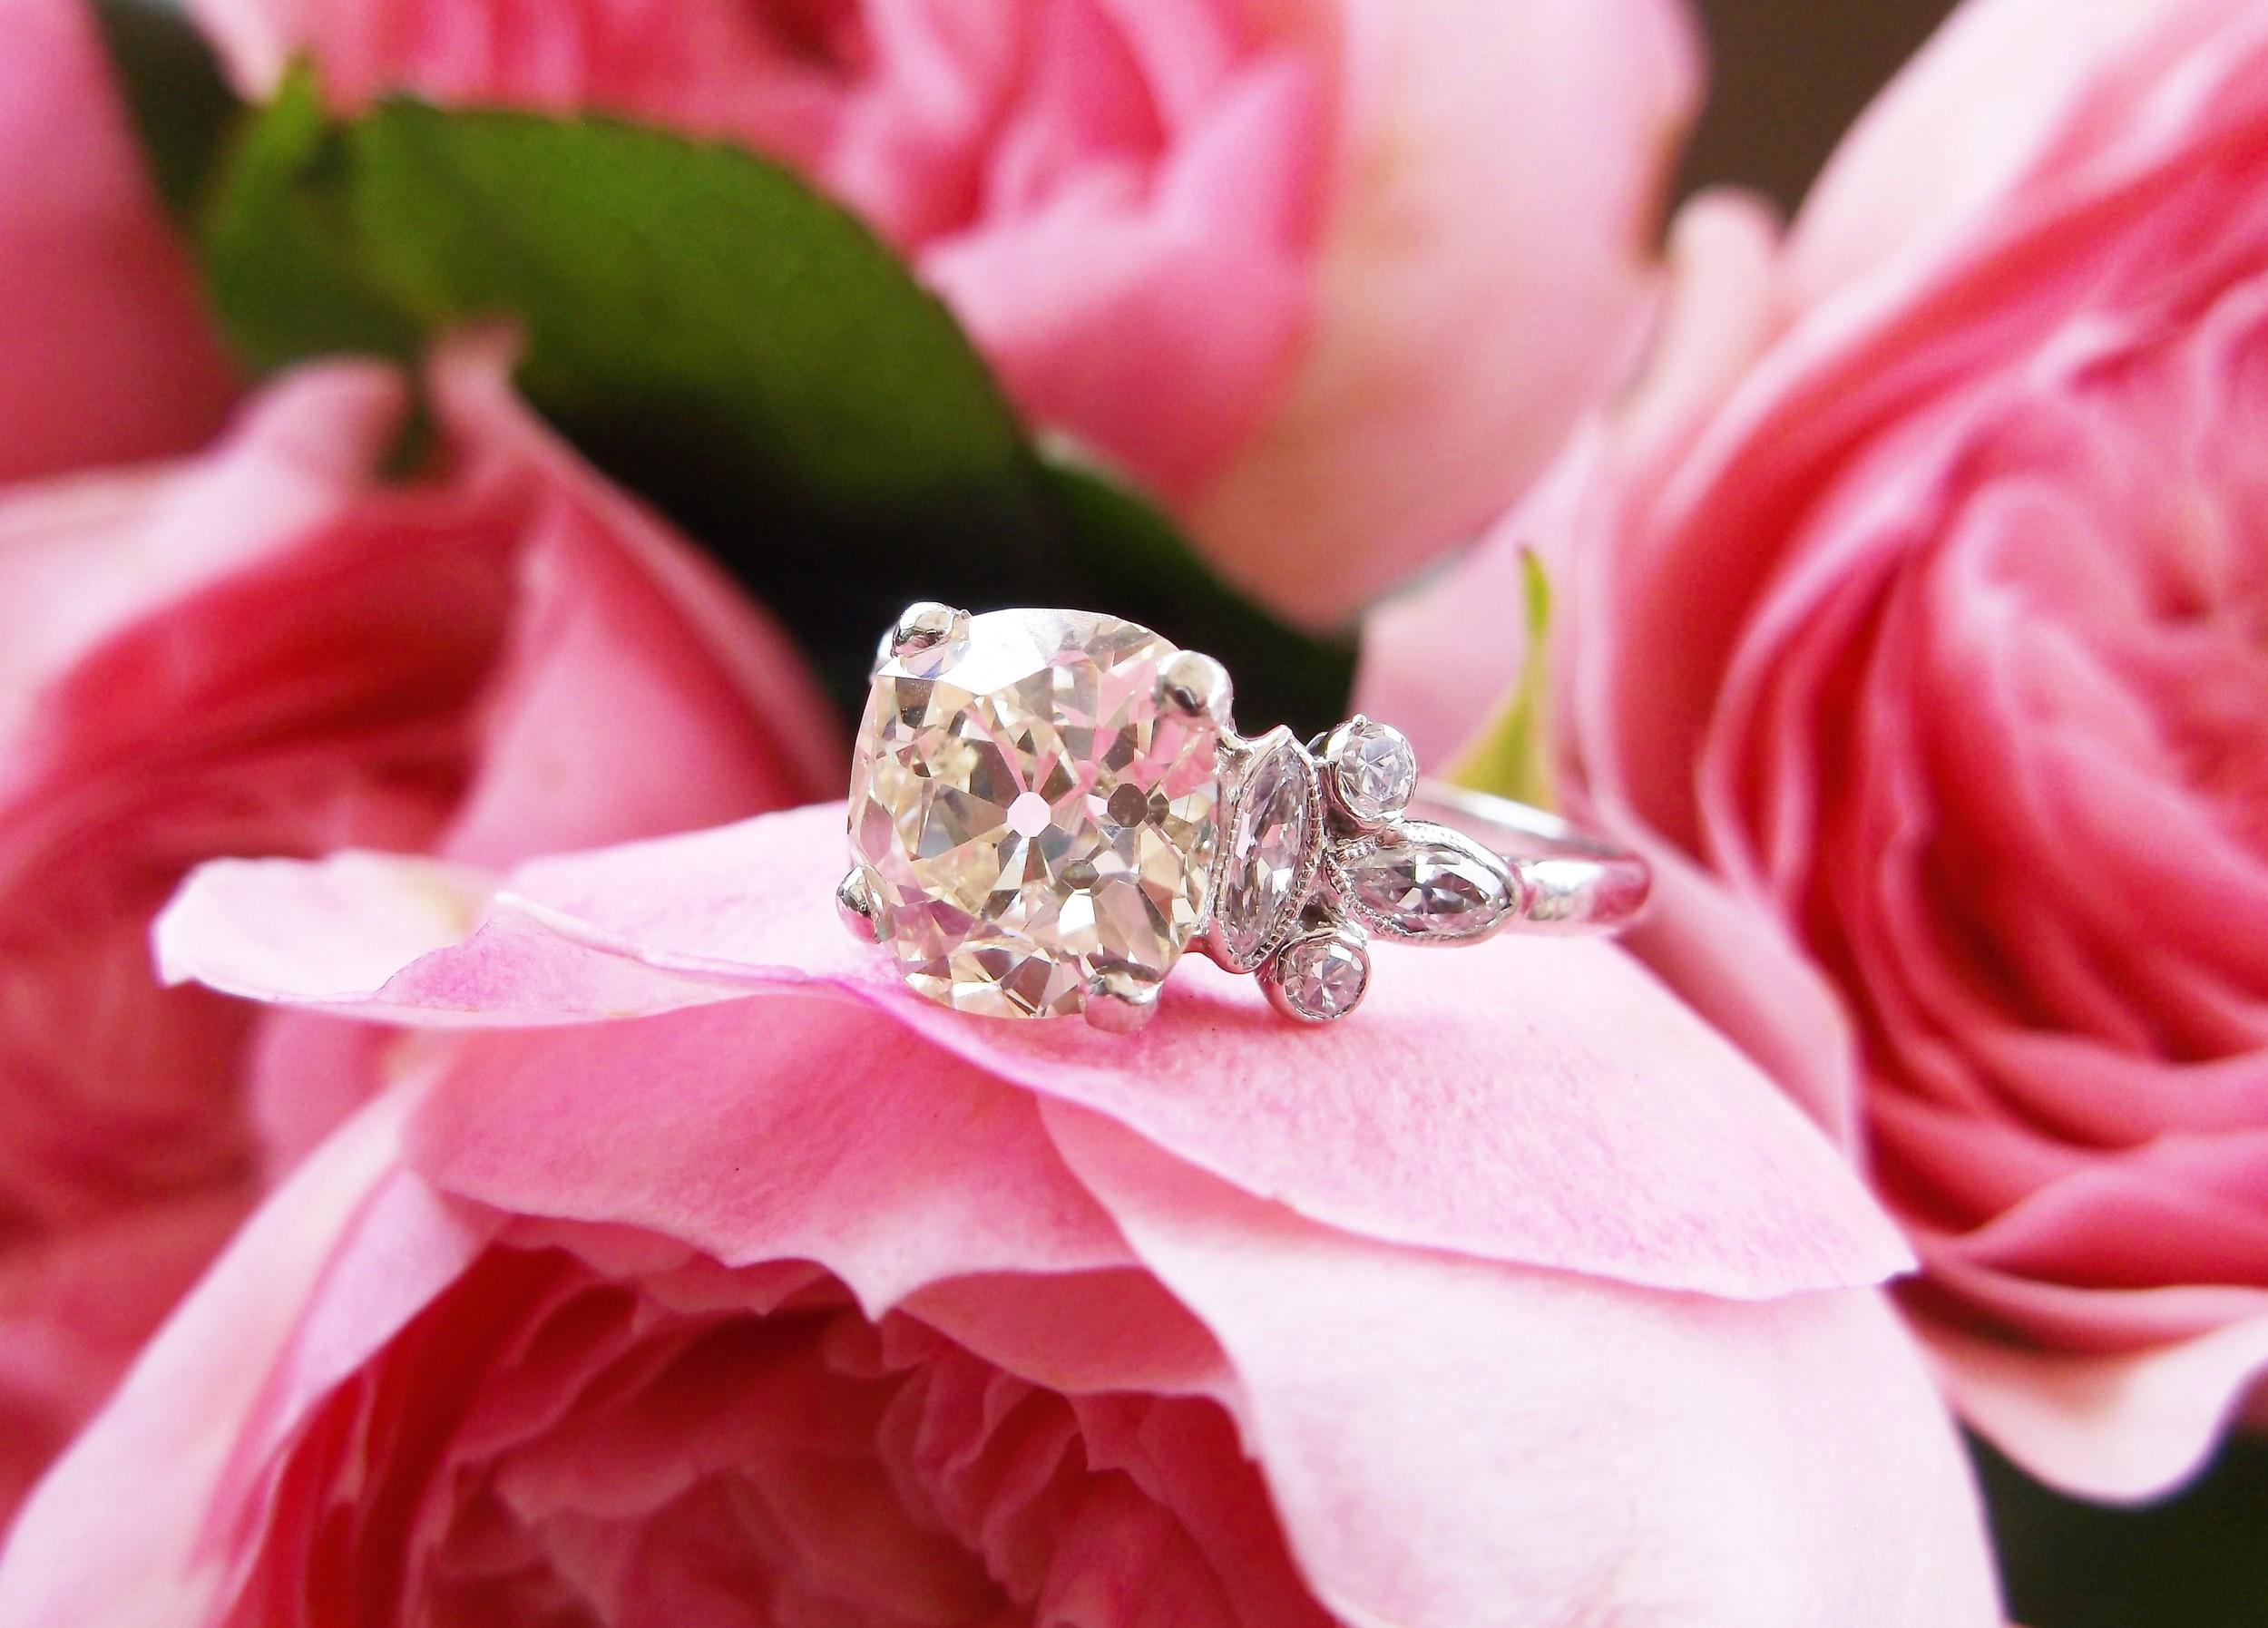 Ravishing 2.38 carat Old Mine cut diamond set in a lovely diamond and platinum mounting.